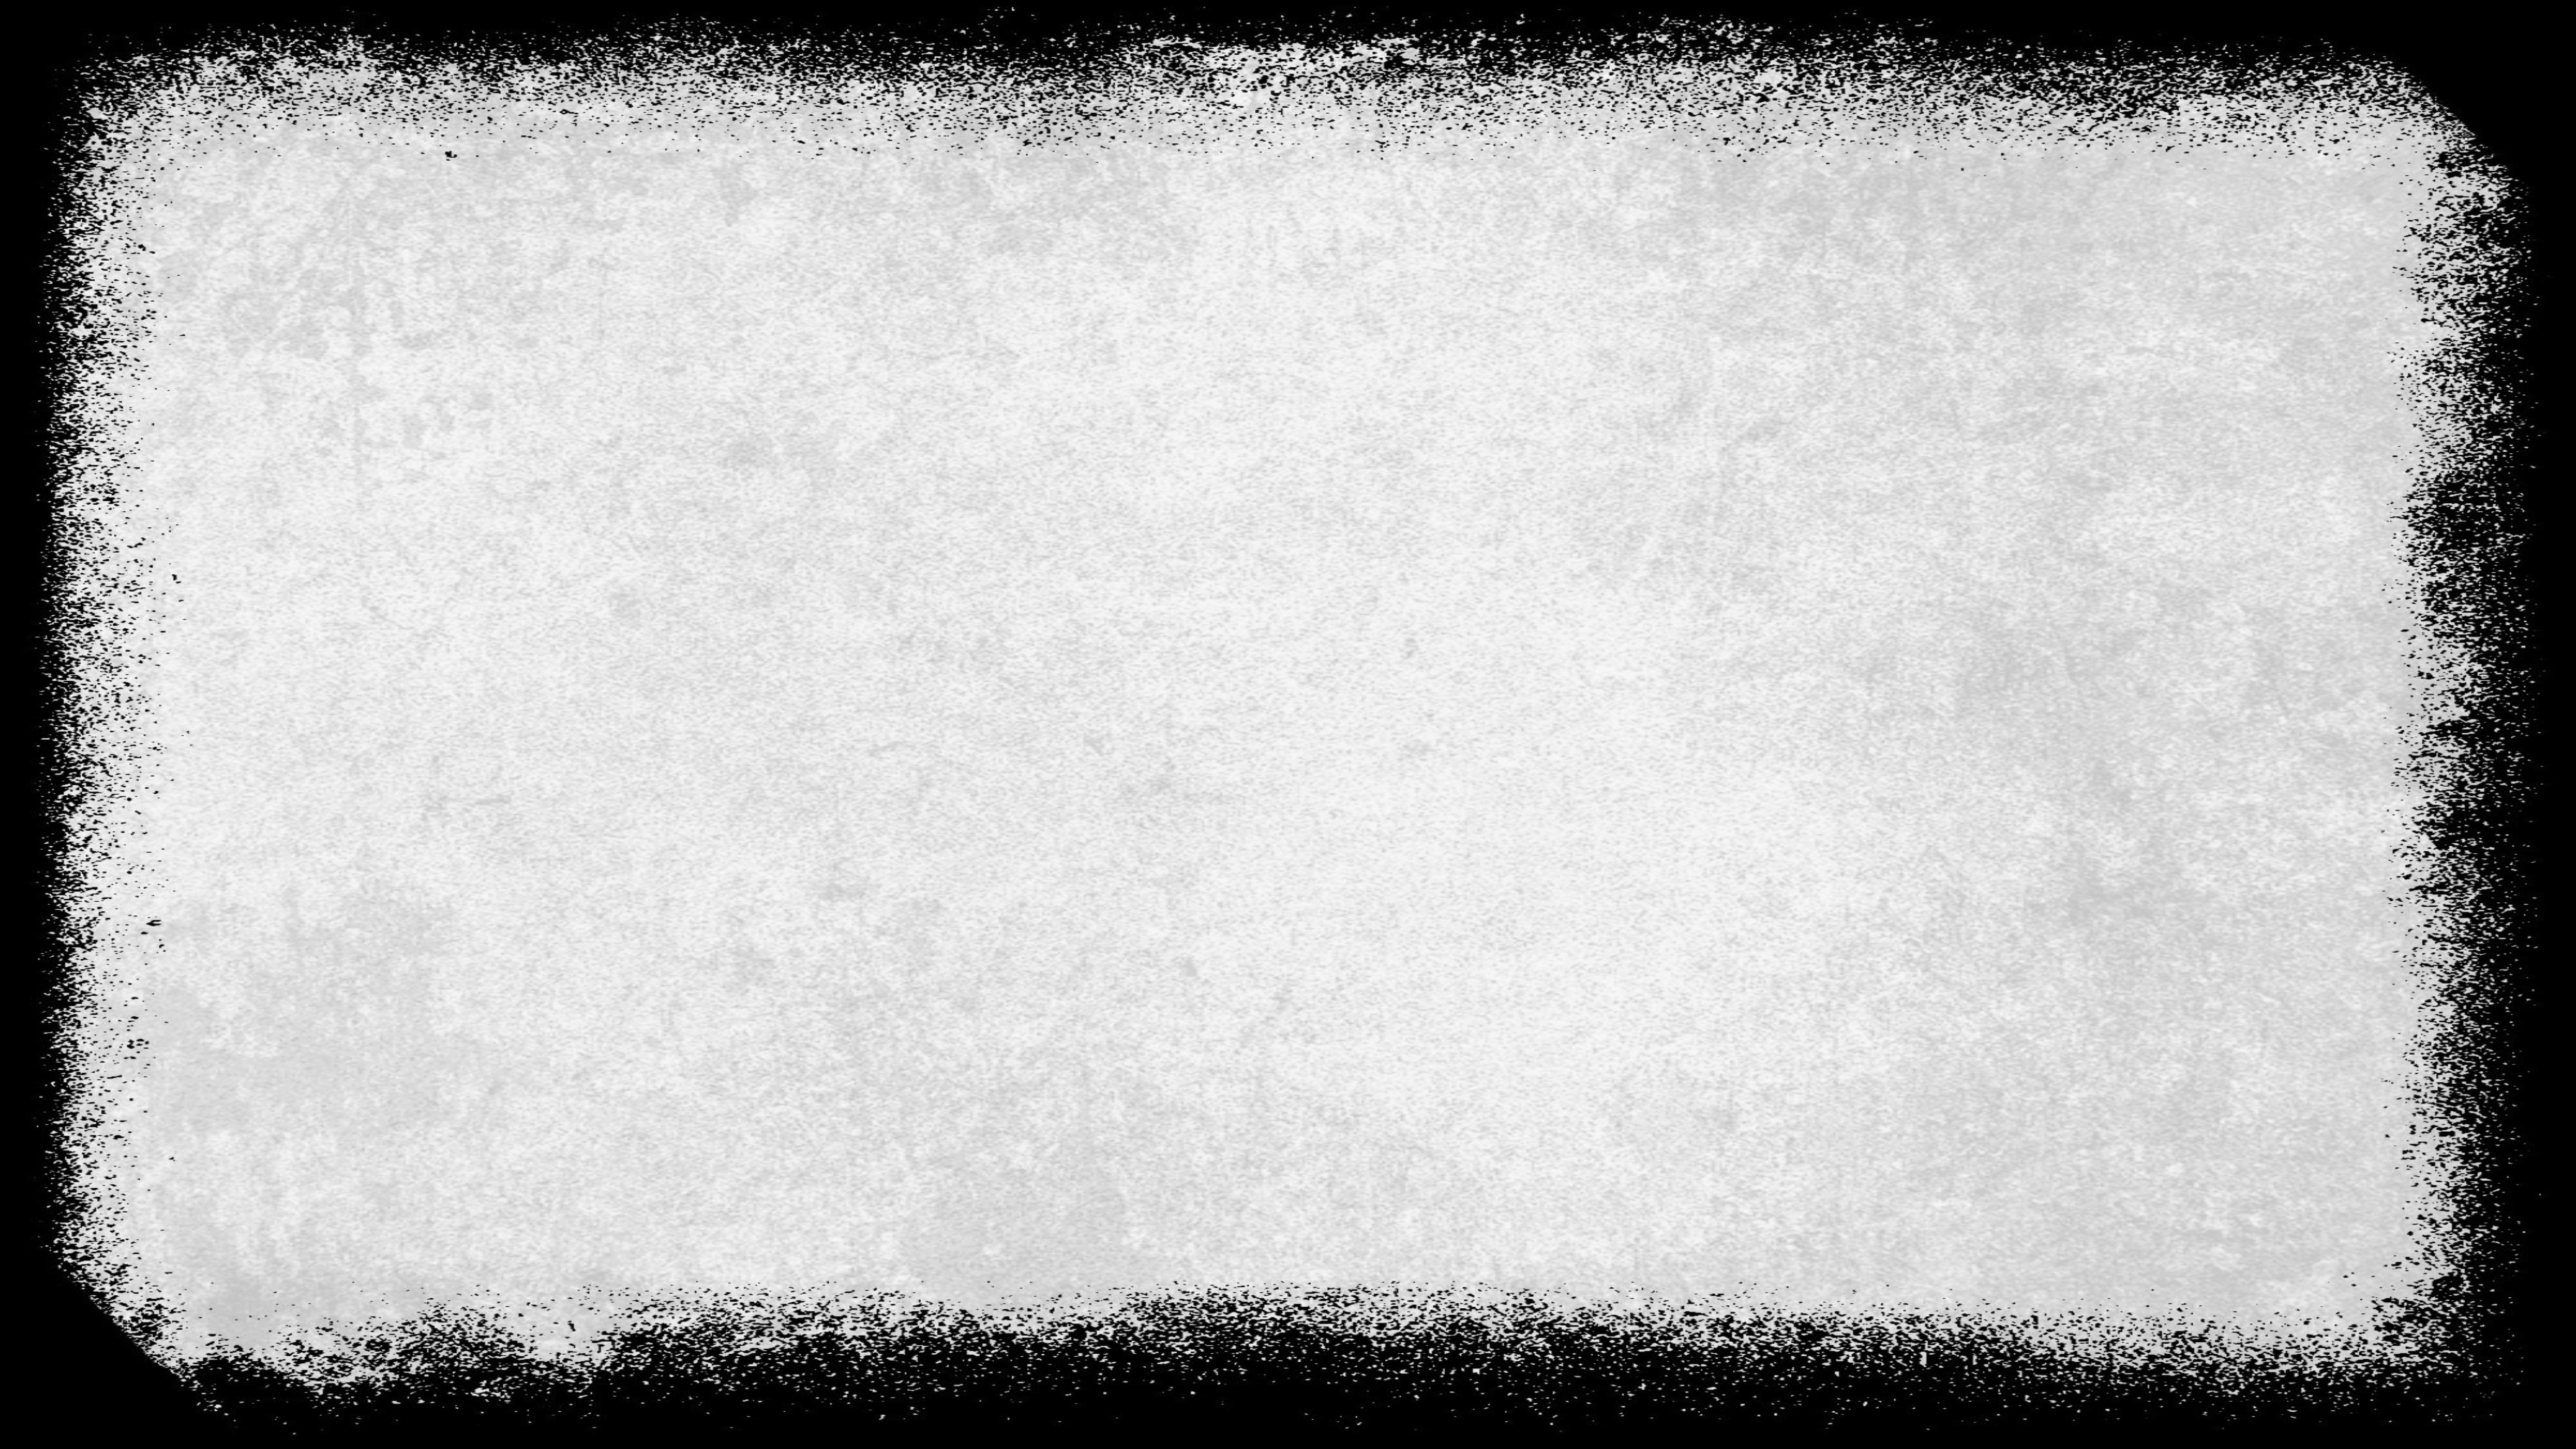 Grunge Border Image Image Adobe Illustrator Free Vector Free Download